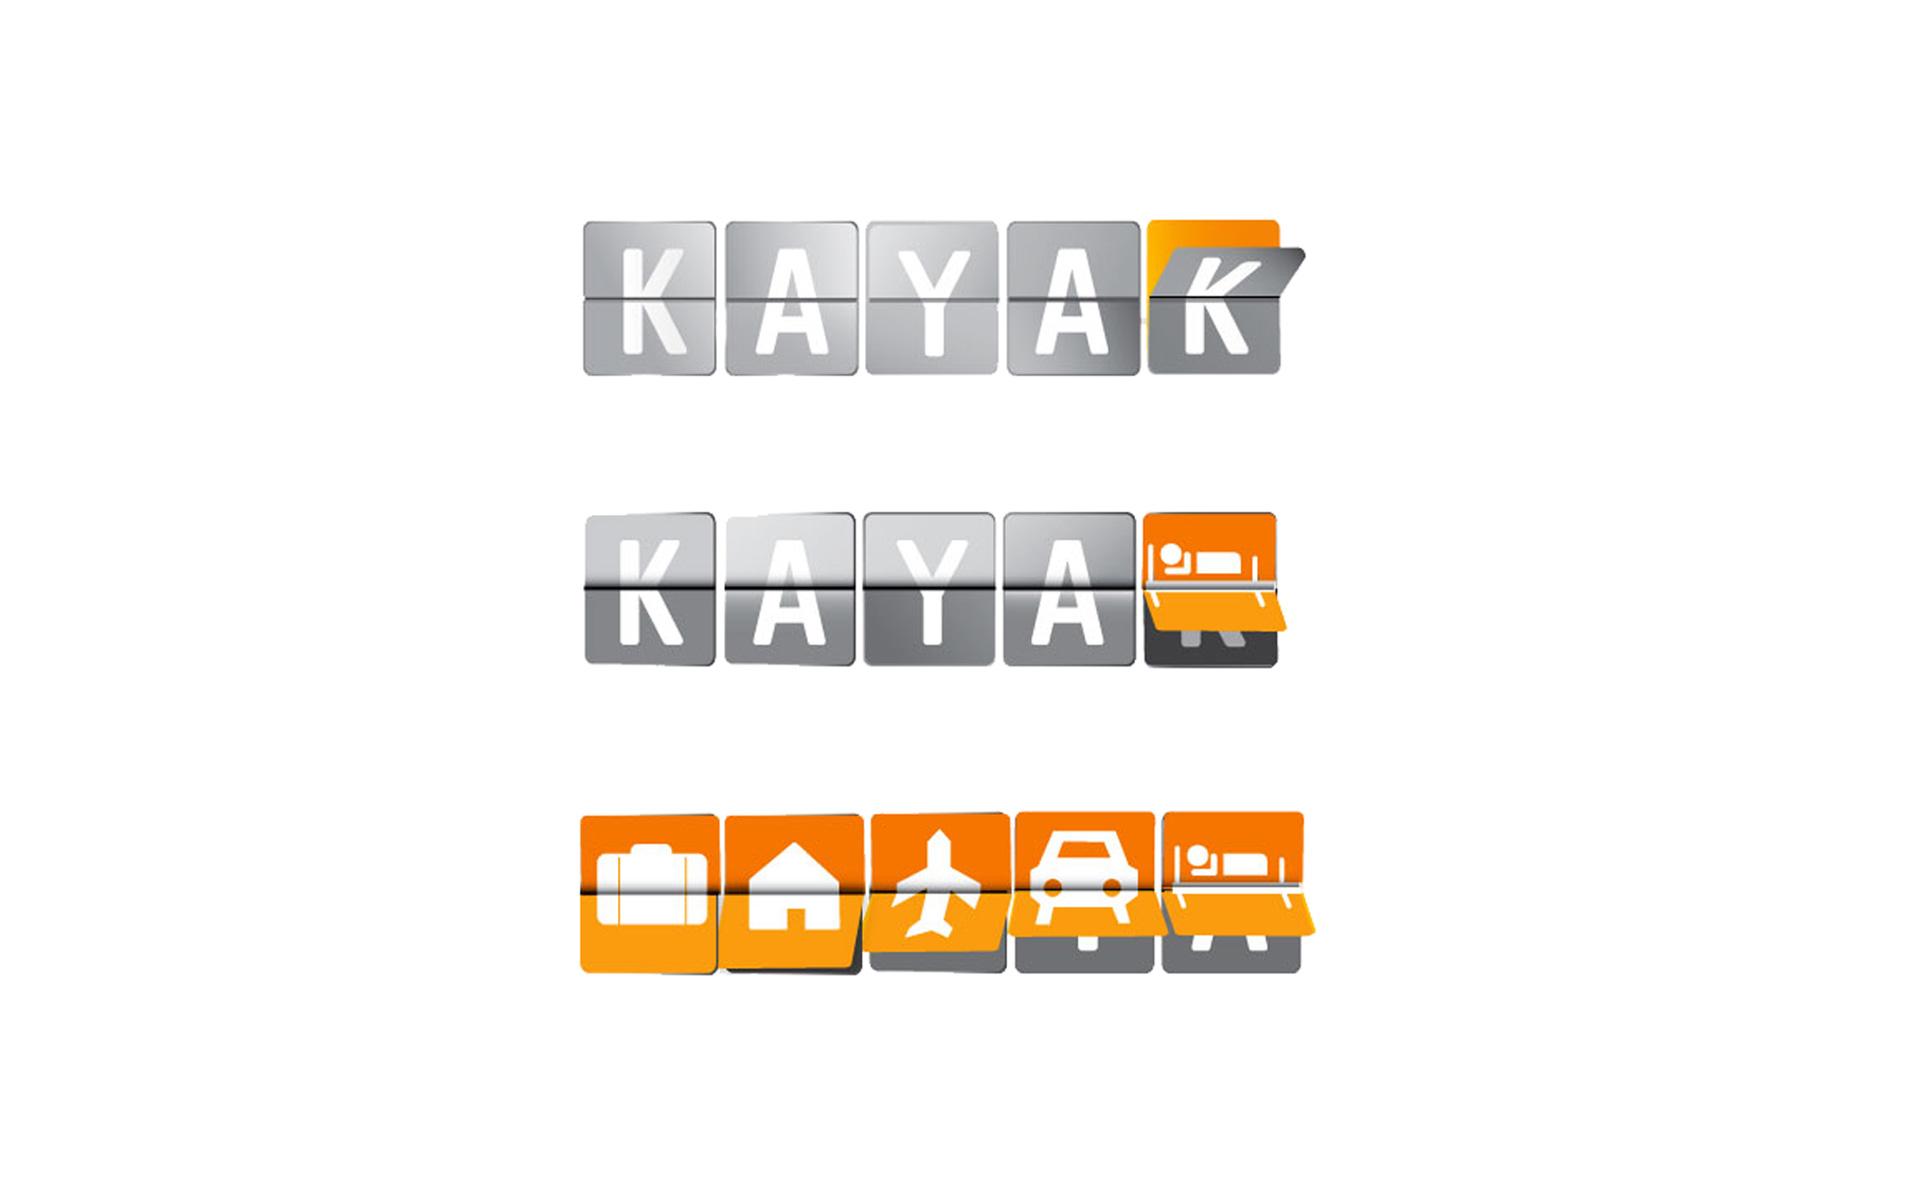 Kayak vuelos en tu reloj de mano